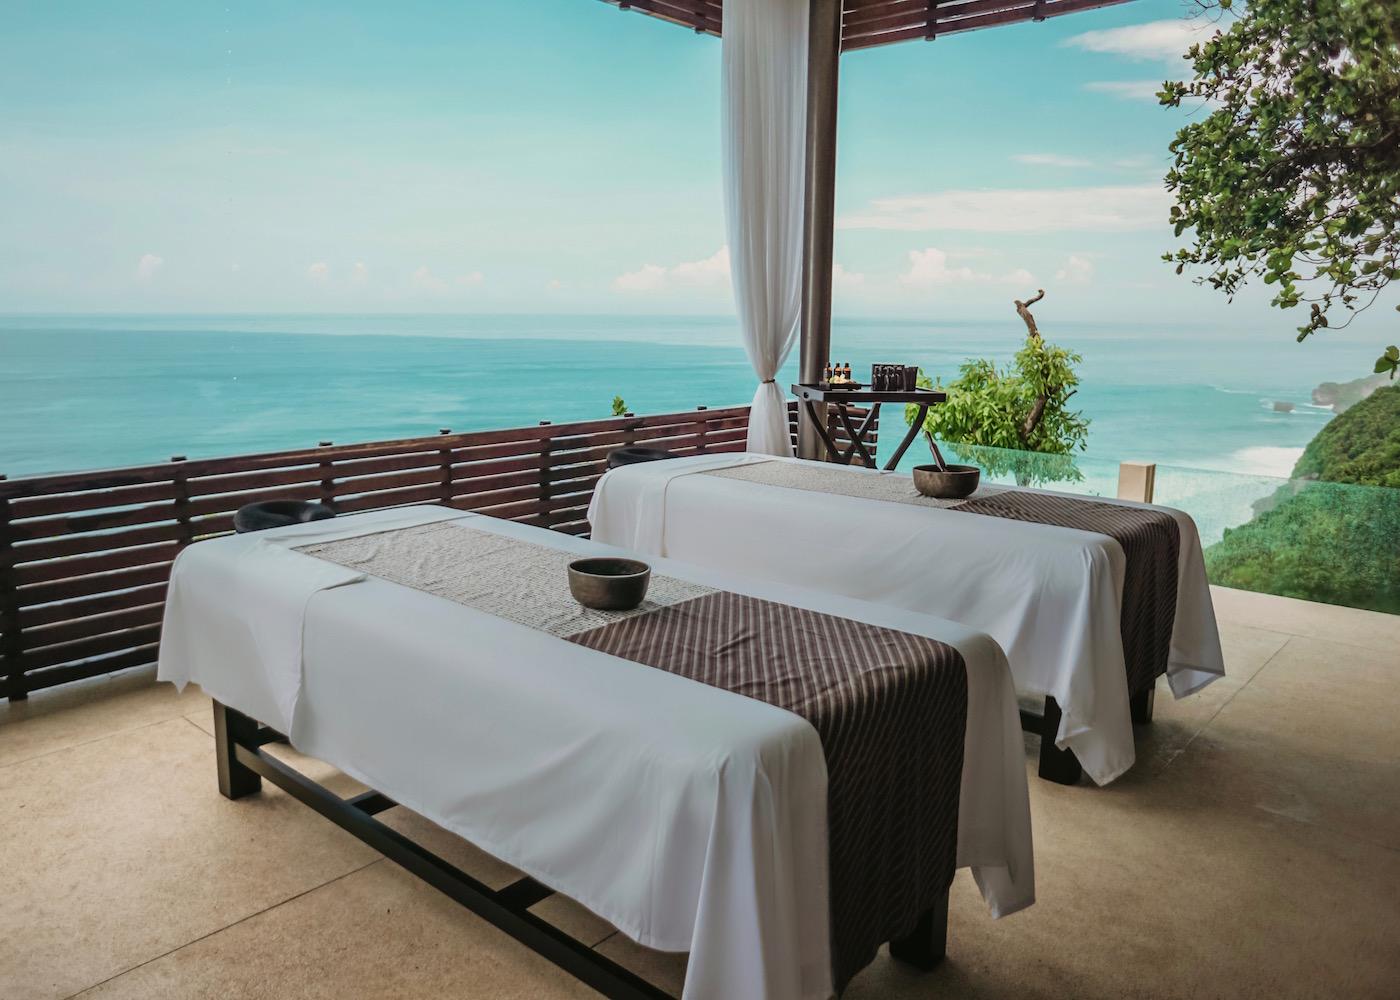 Alila Villas Uluwatu in Bali - Cliff Edge Spa Cabana